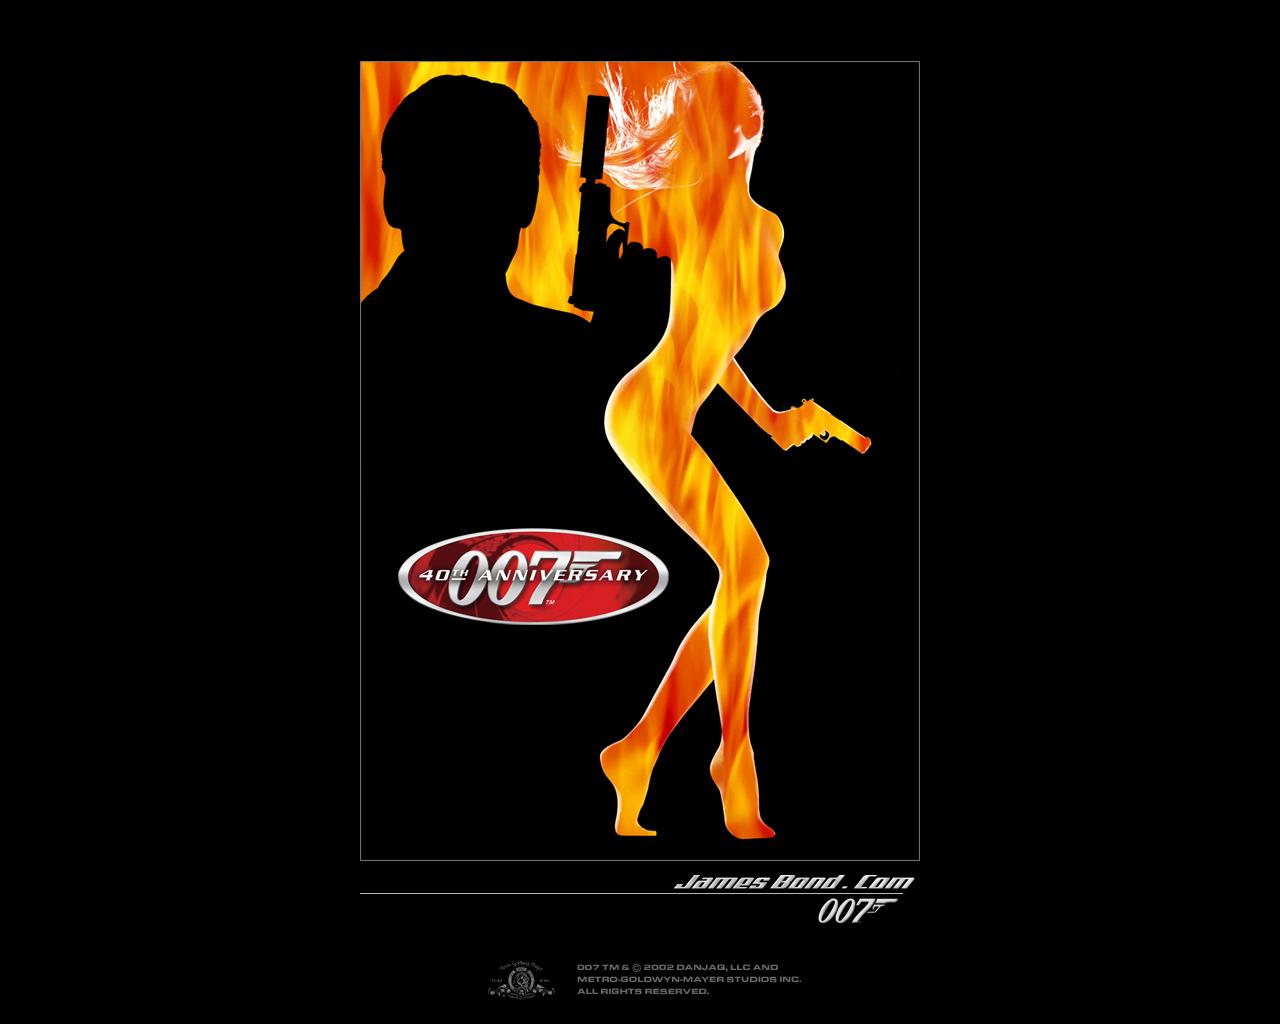 James Bond 007 Logo Wallpaper James bond wallpaper 1280x1024